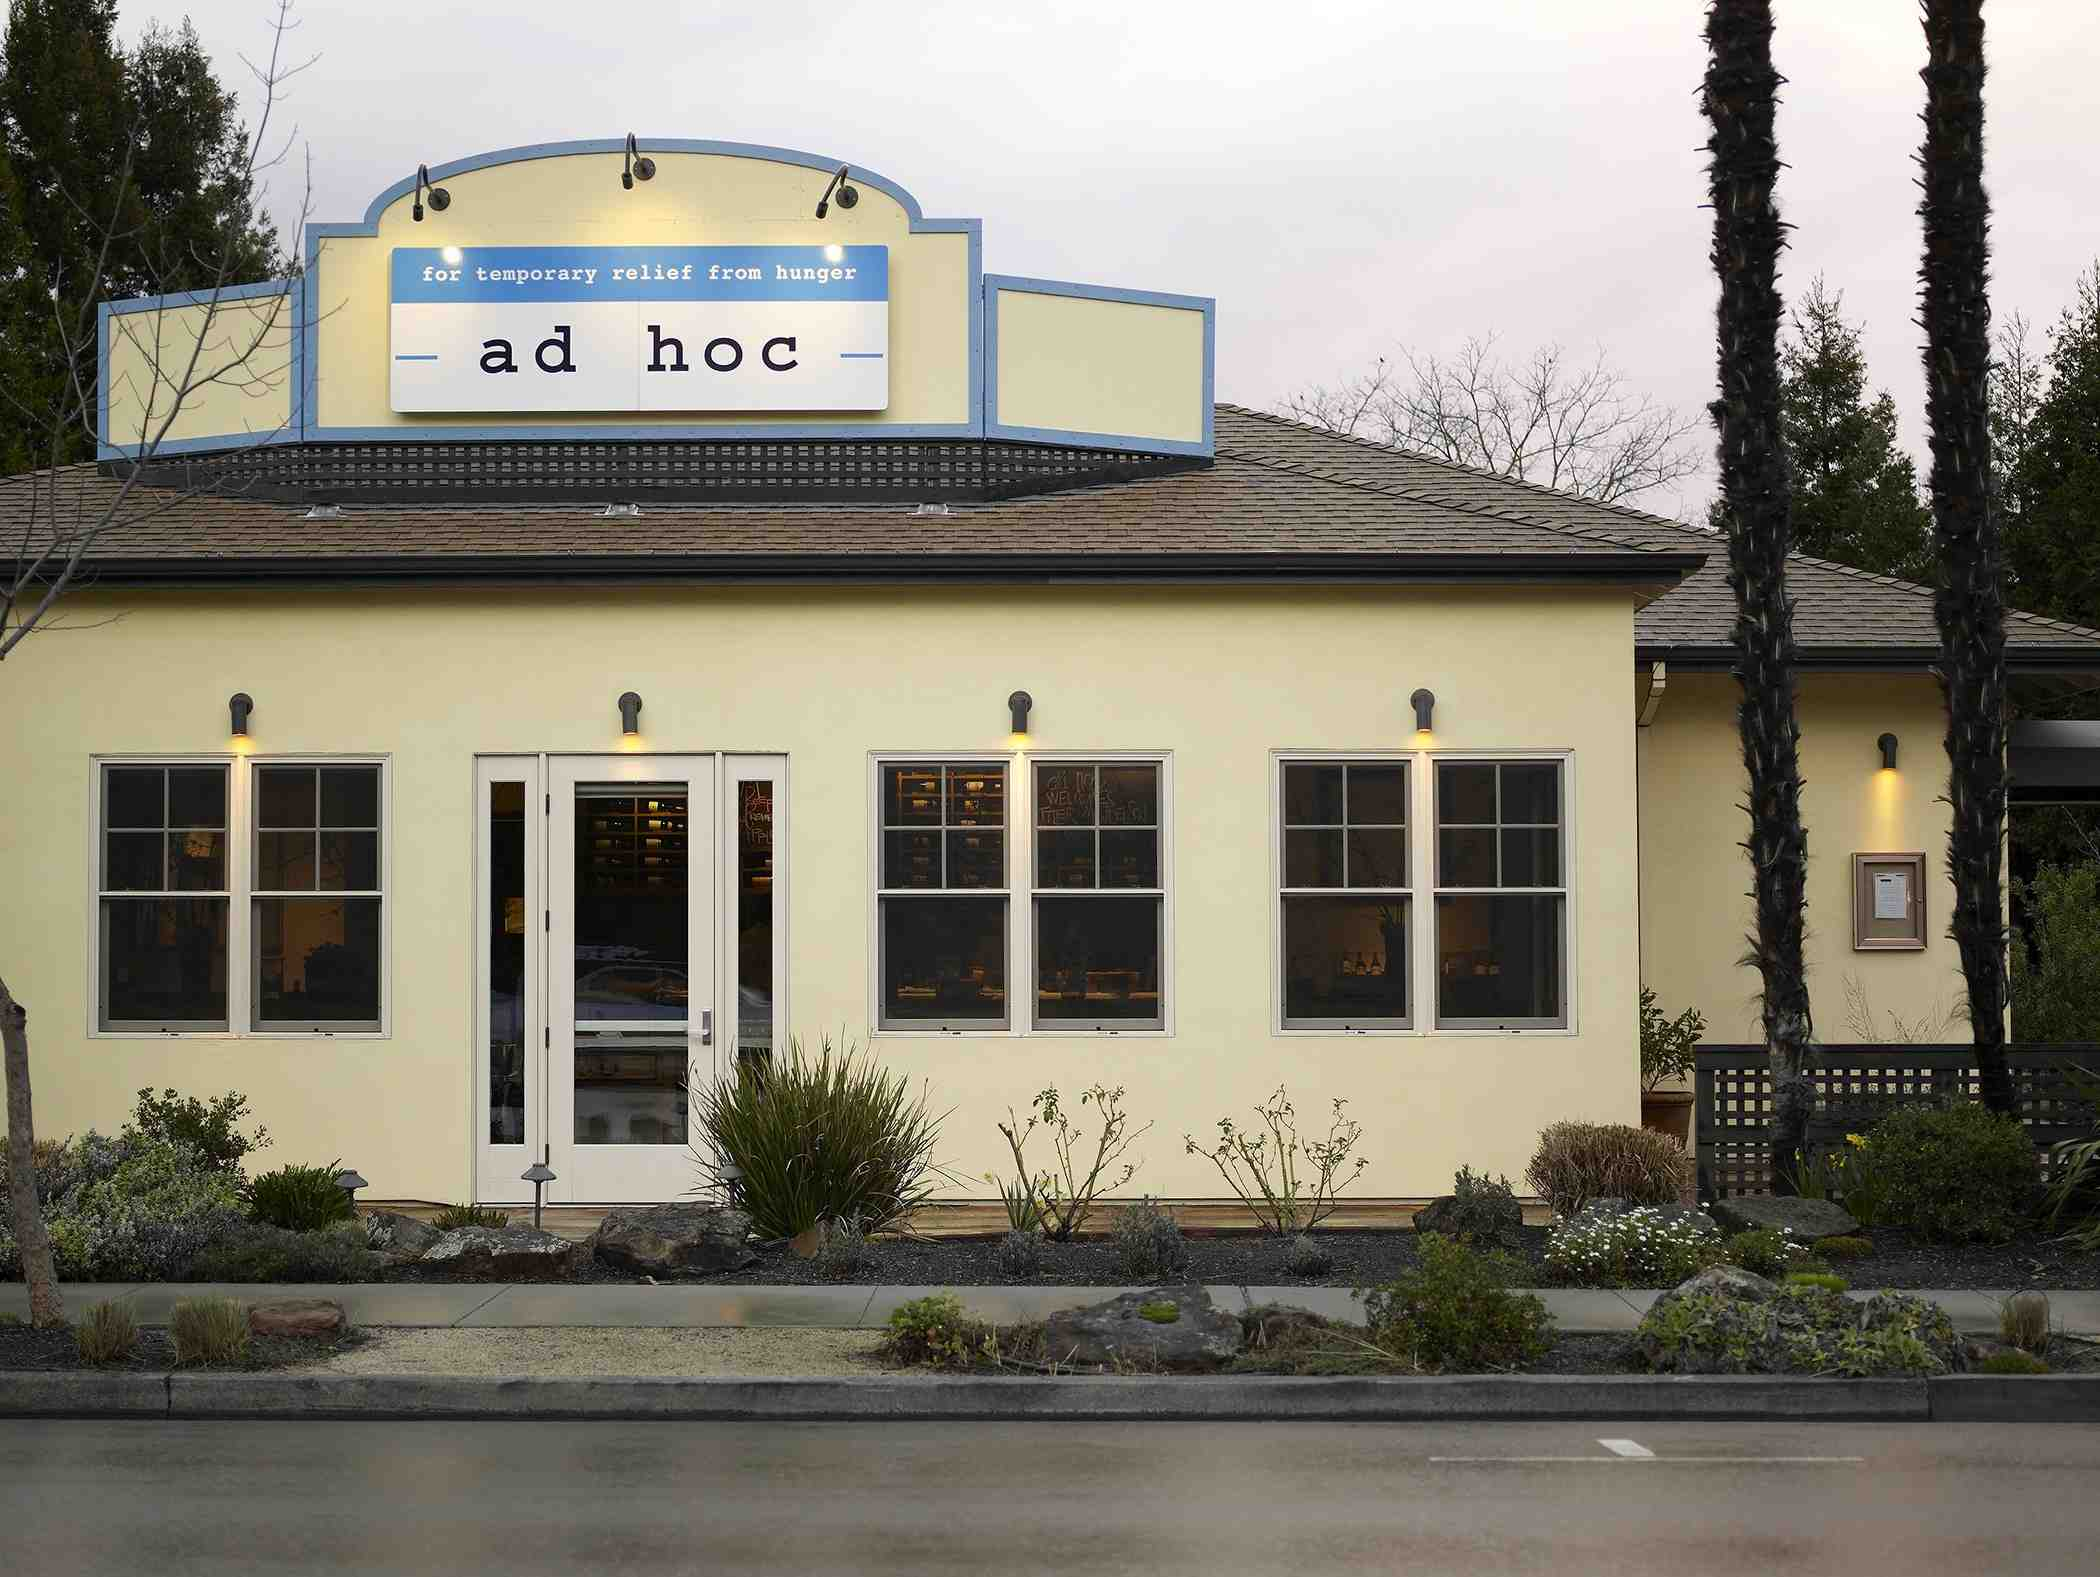 Thomas Keller's ad hoc restaurant